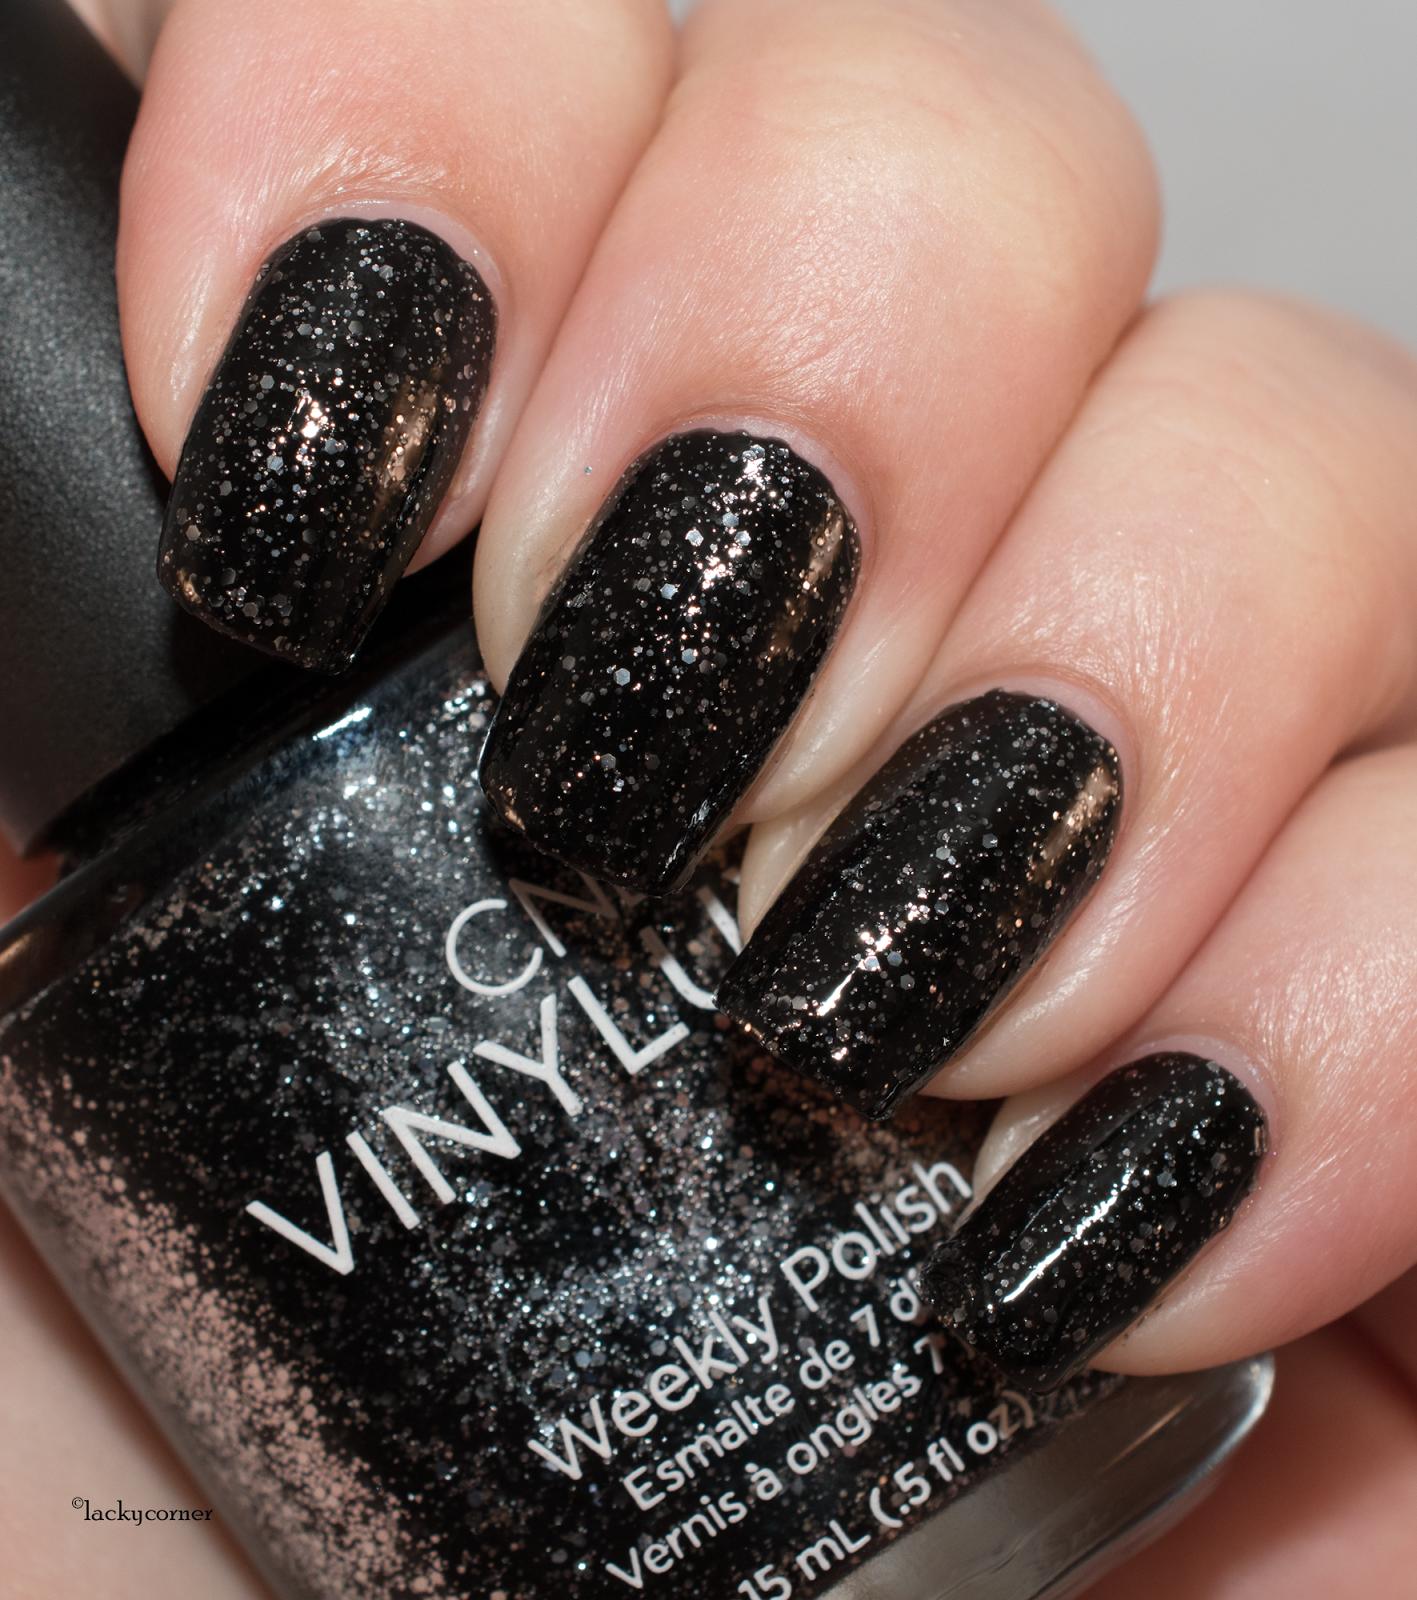 CND Vinylux - Dark Diamonds | Cnd vinylux, Designer nails and Nail envy